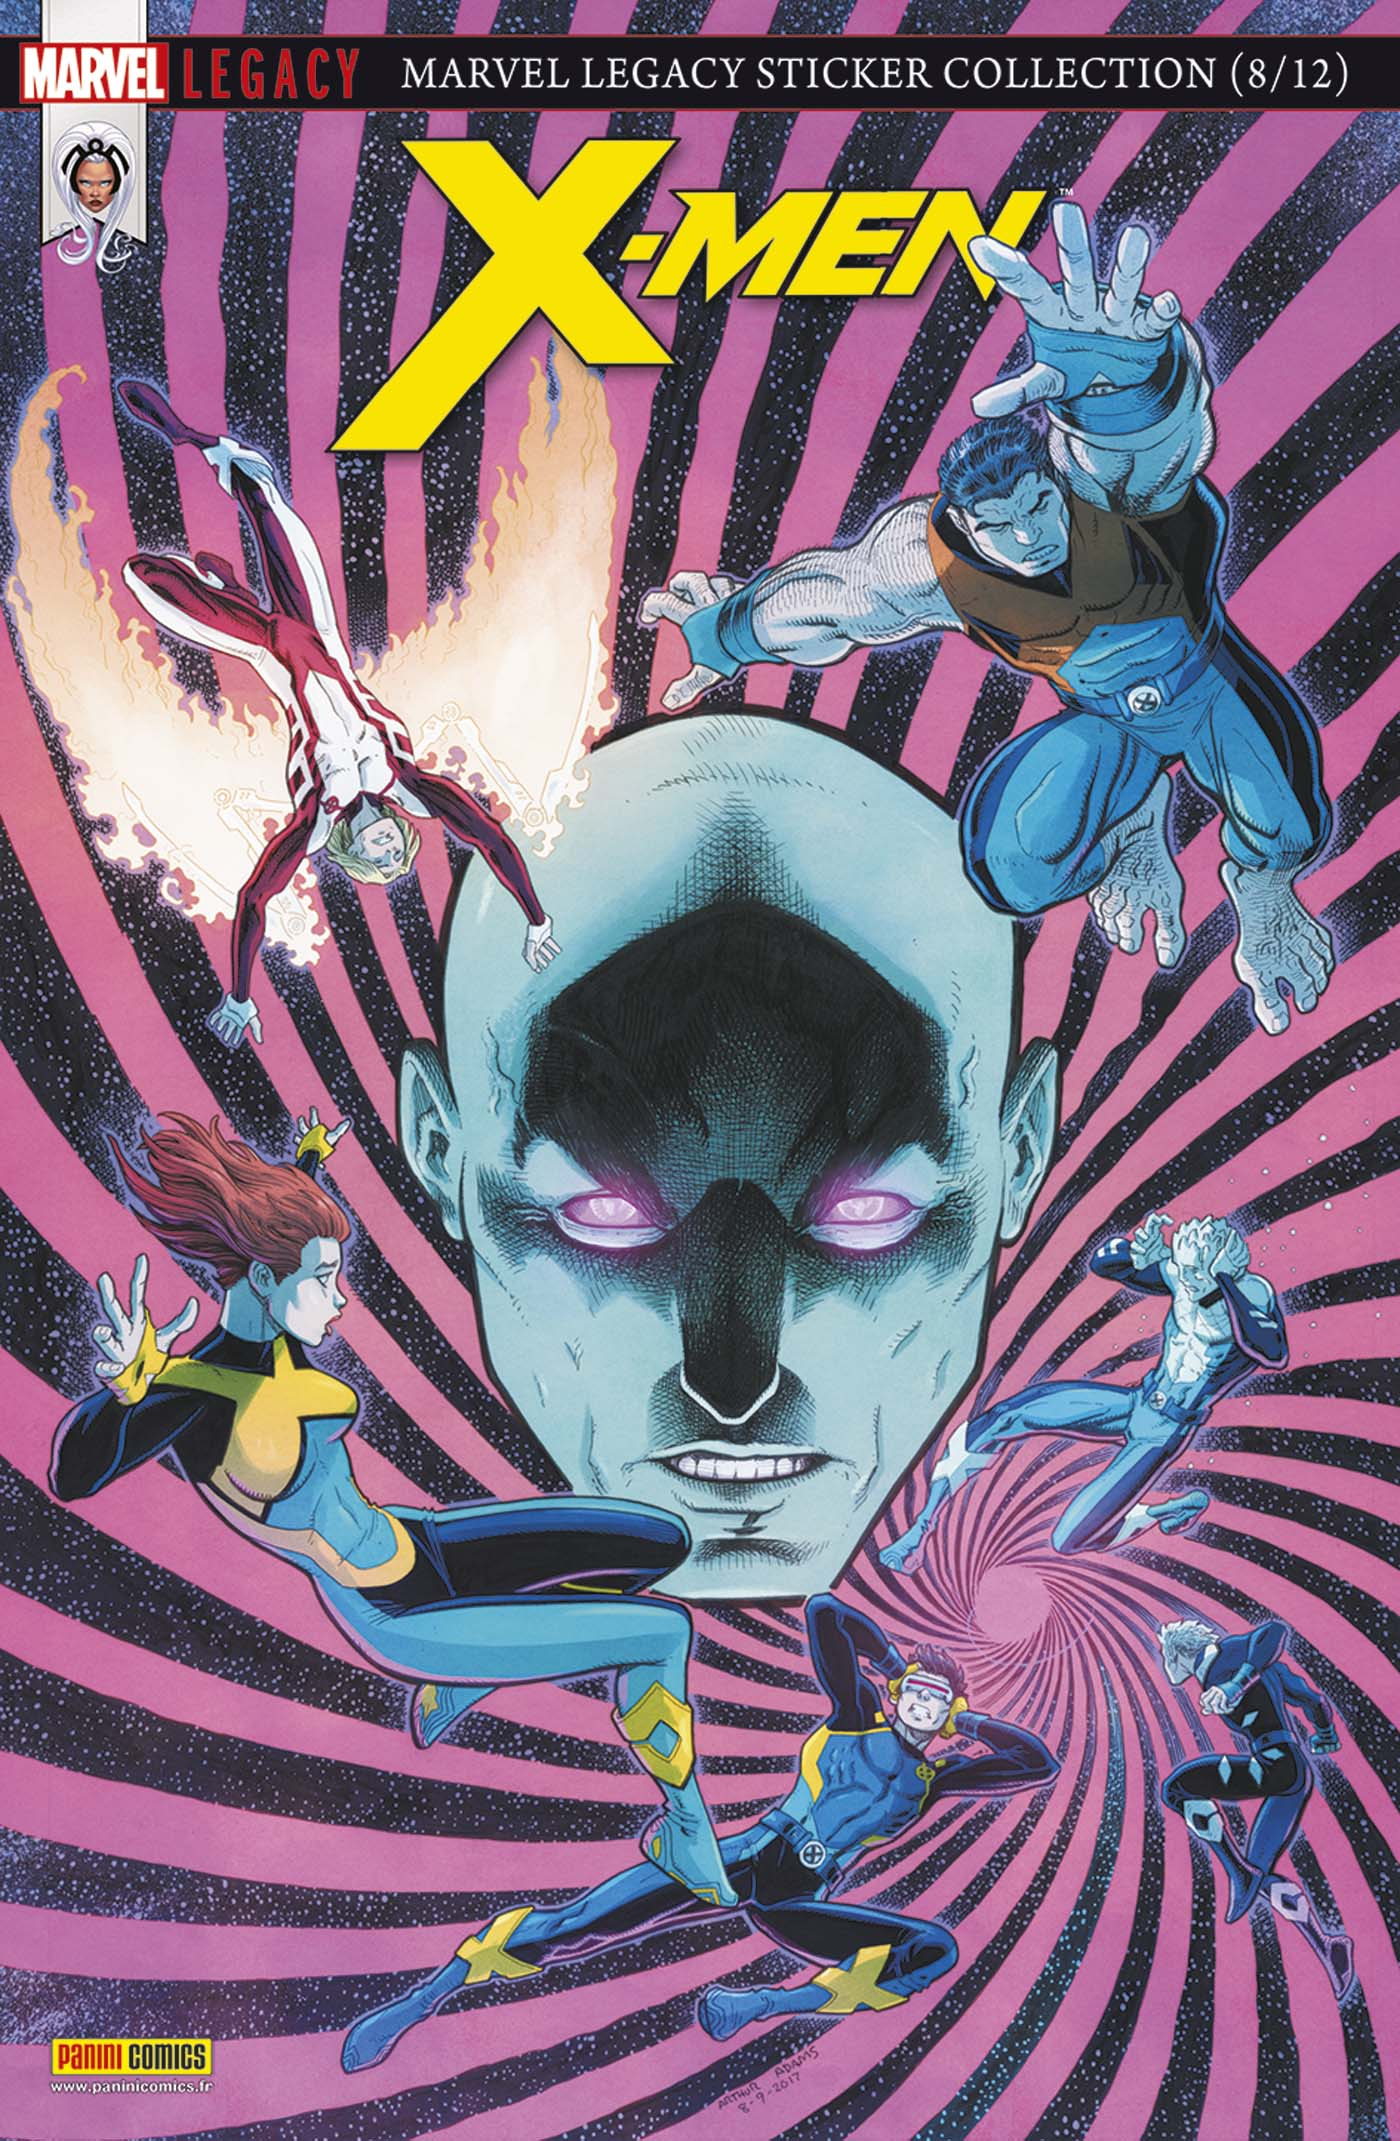 Marvel Legacy - X-Men 2